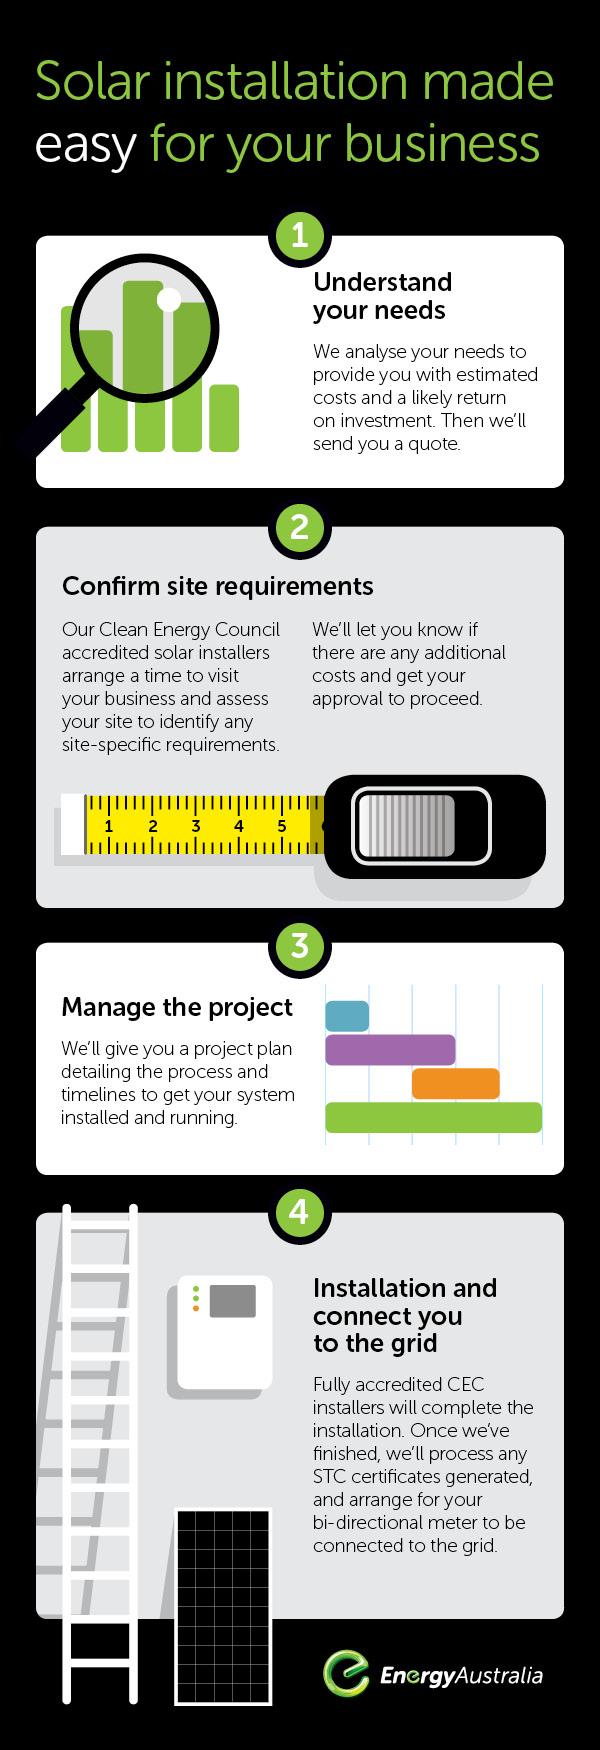 EA0442-installation-infographic.jpg